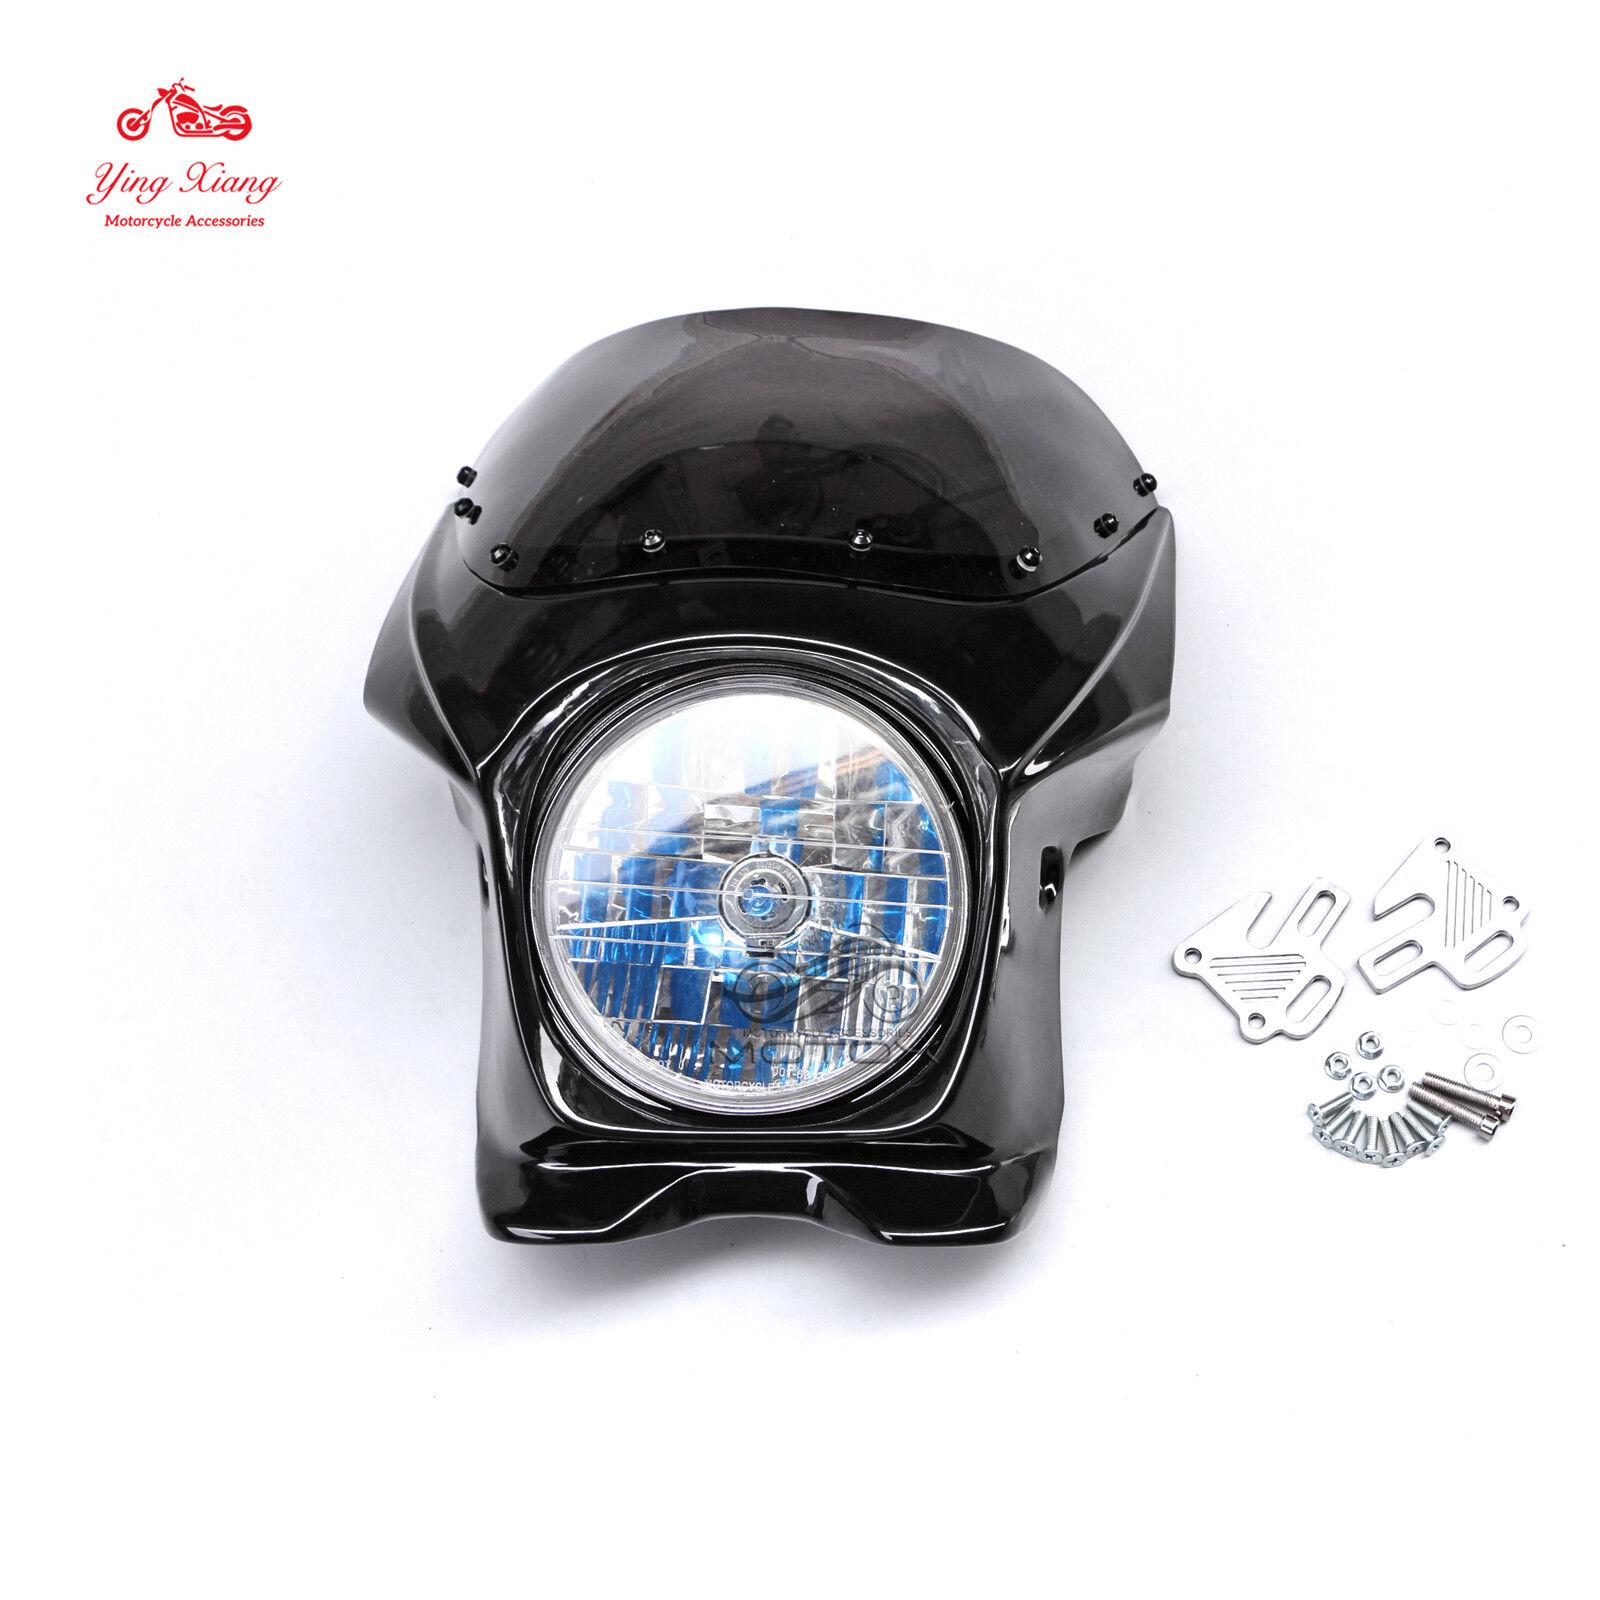 Front Upper Cowl Nose Fairing Headlight Fit For CB400/1300 GSXR400 ZRX400 XJR400